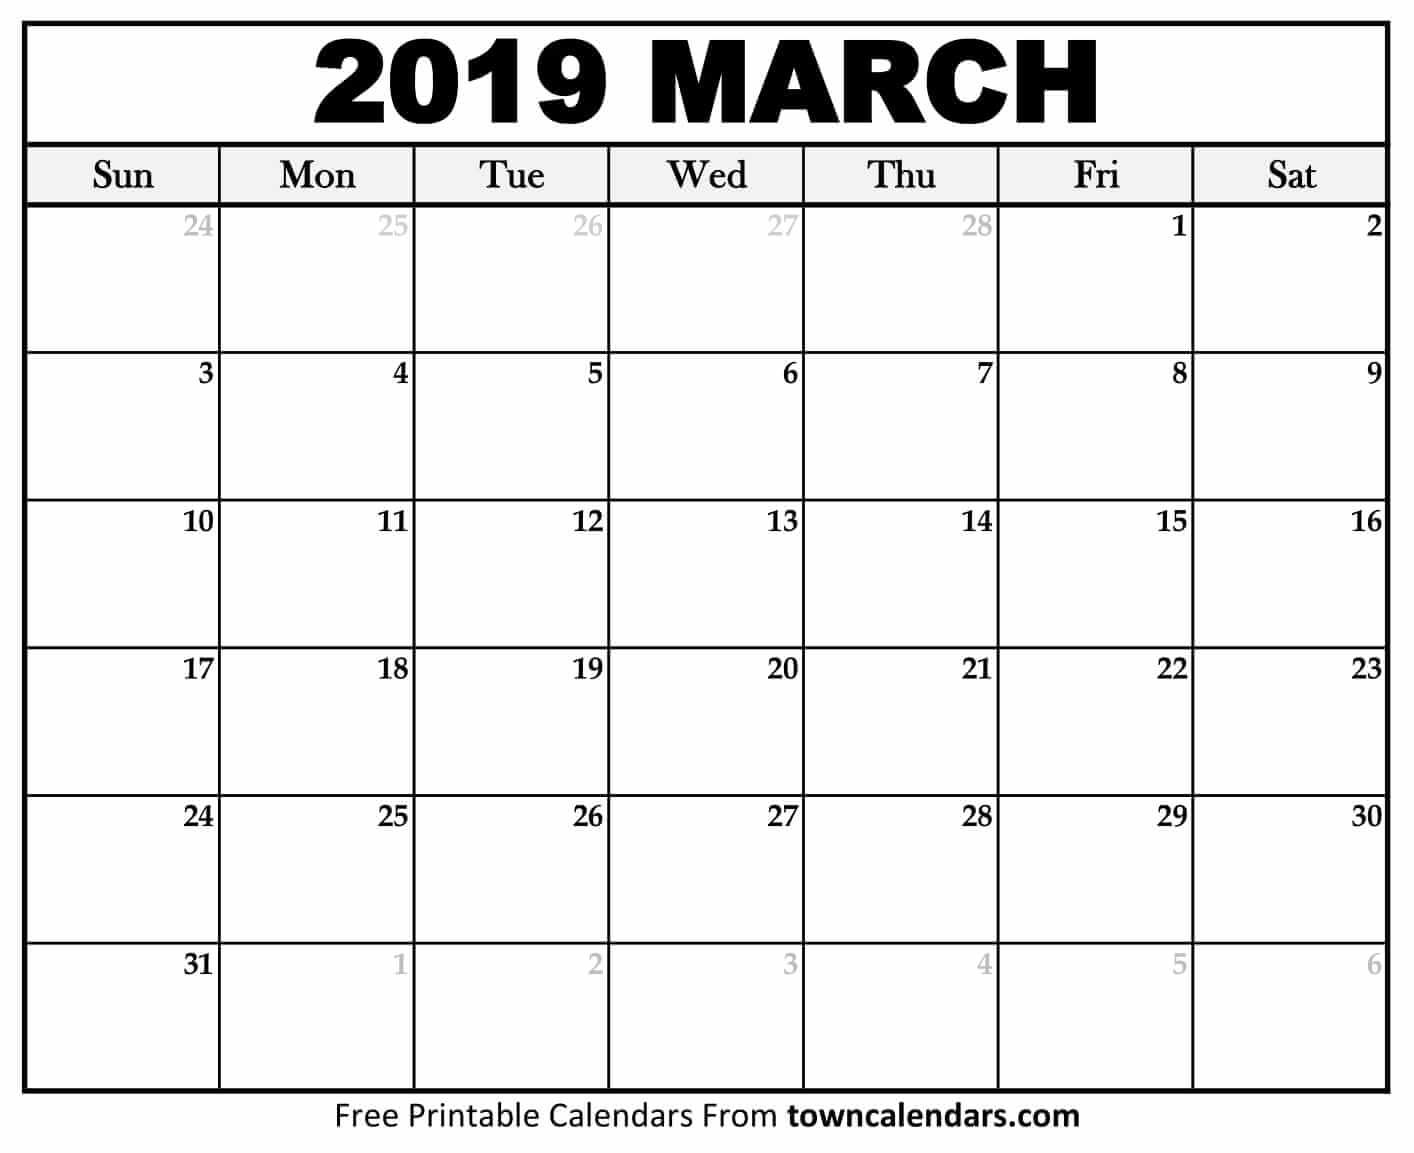 Printable March 2019 Calendar - Towncalendars Calendar Of 2019 March